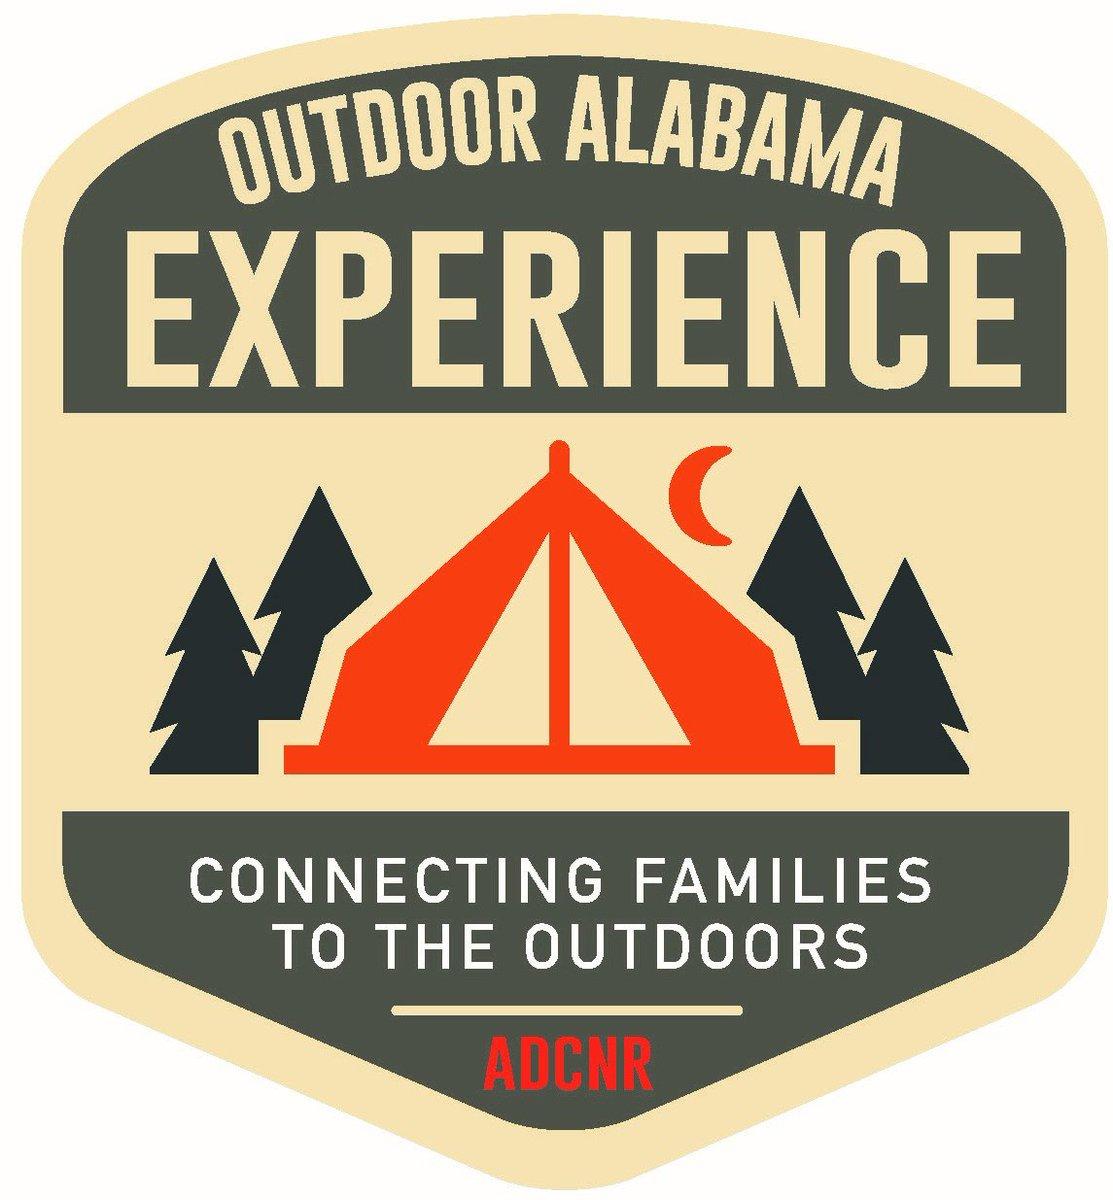 Outdoor Alabama (@Outdoor_Alabama) | Twitter